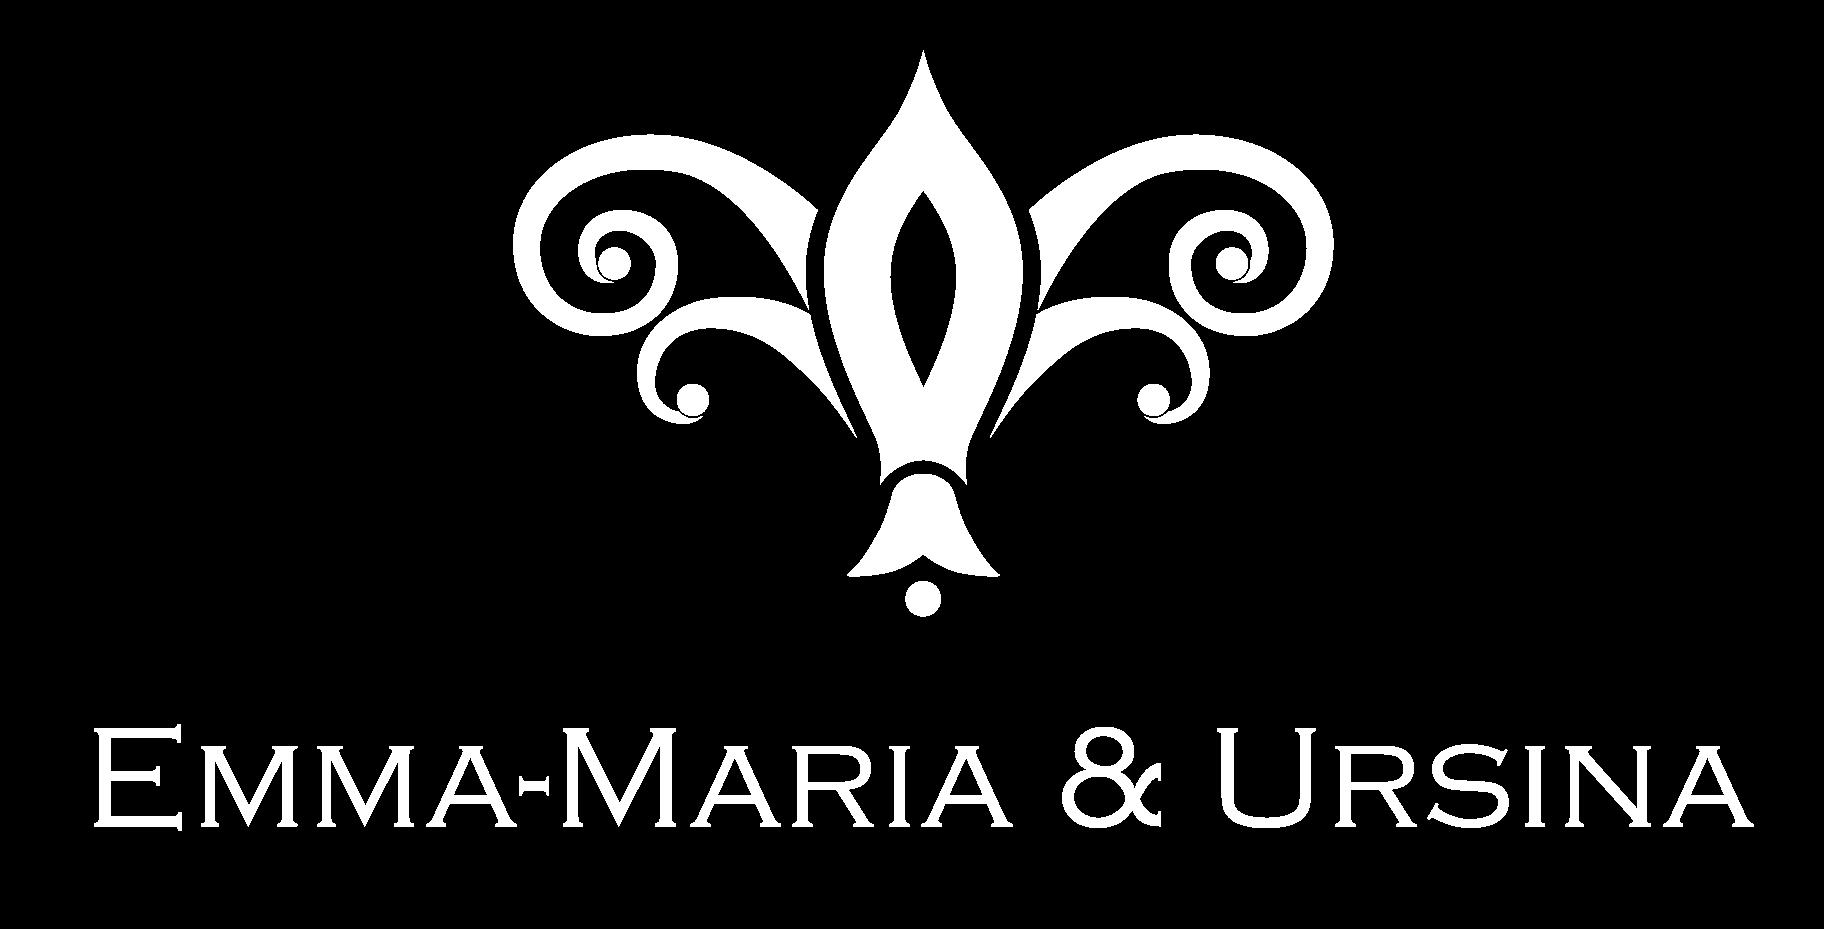 Emma-Maria & Ursina